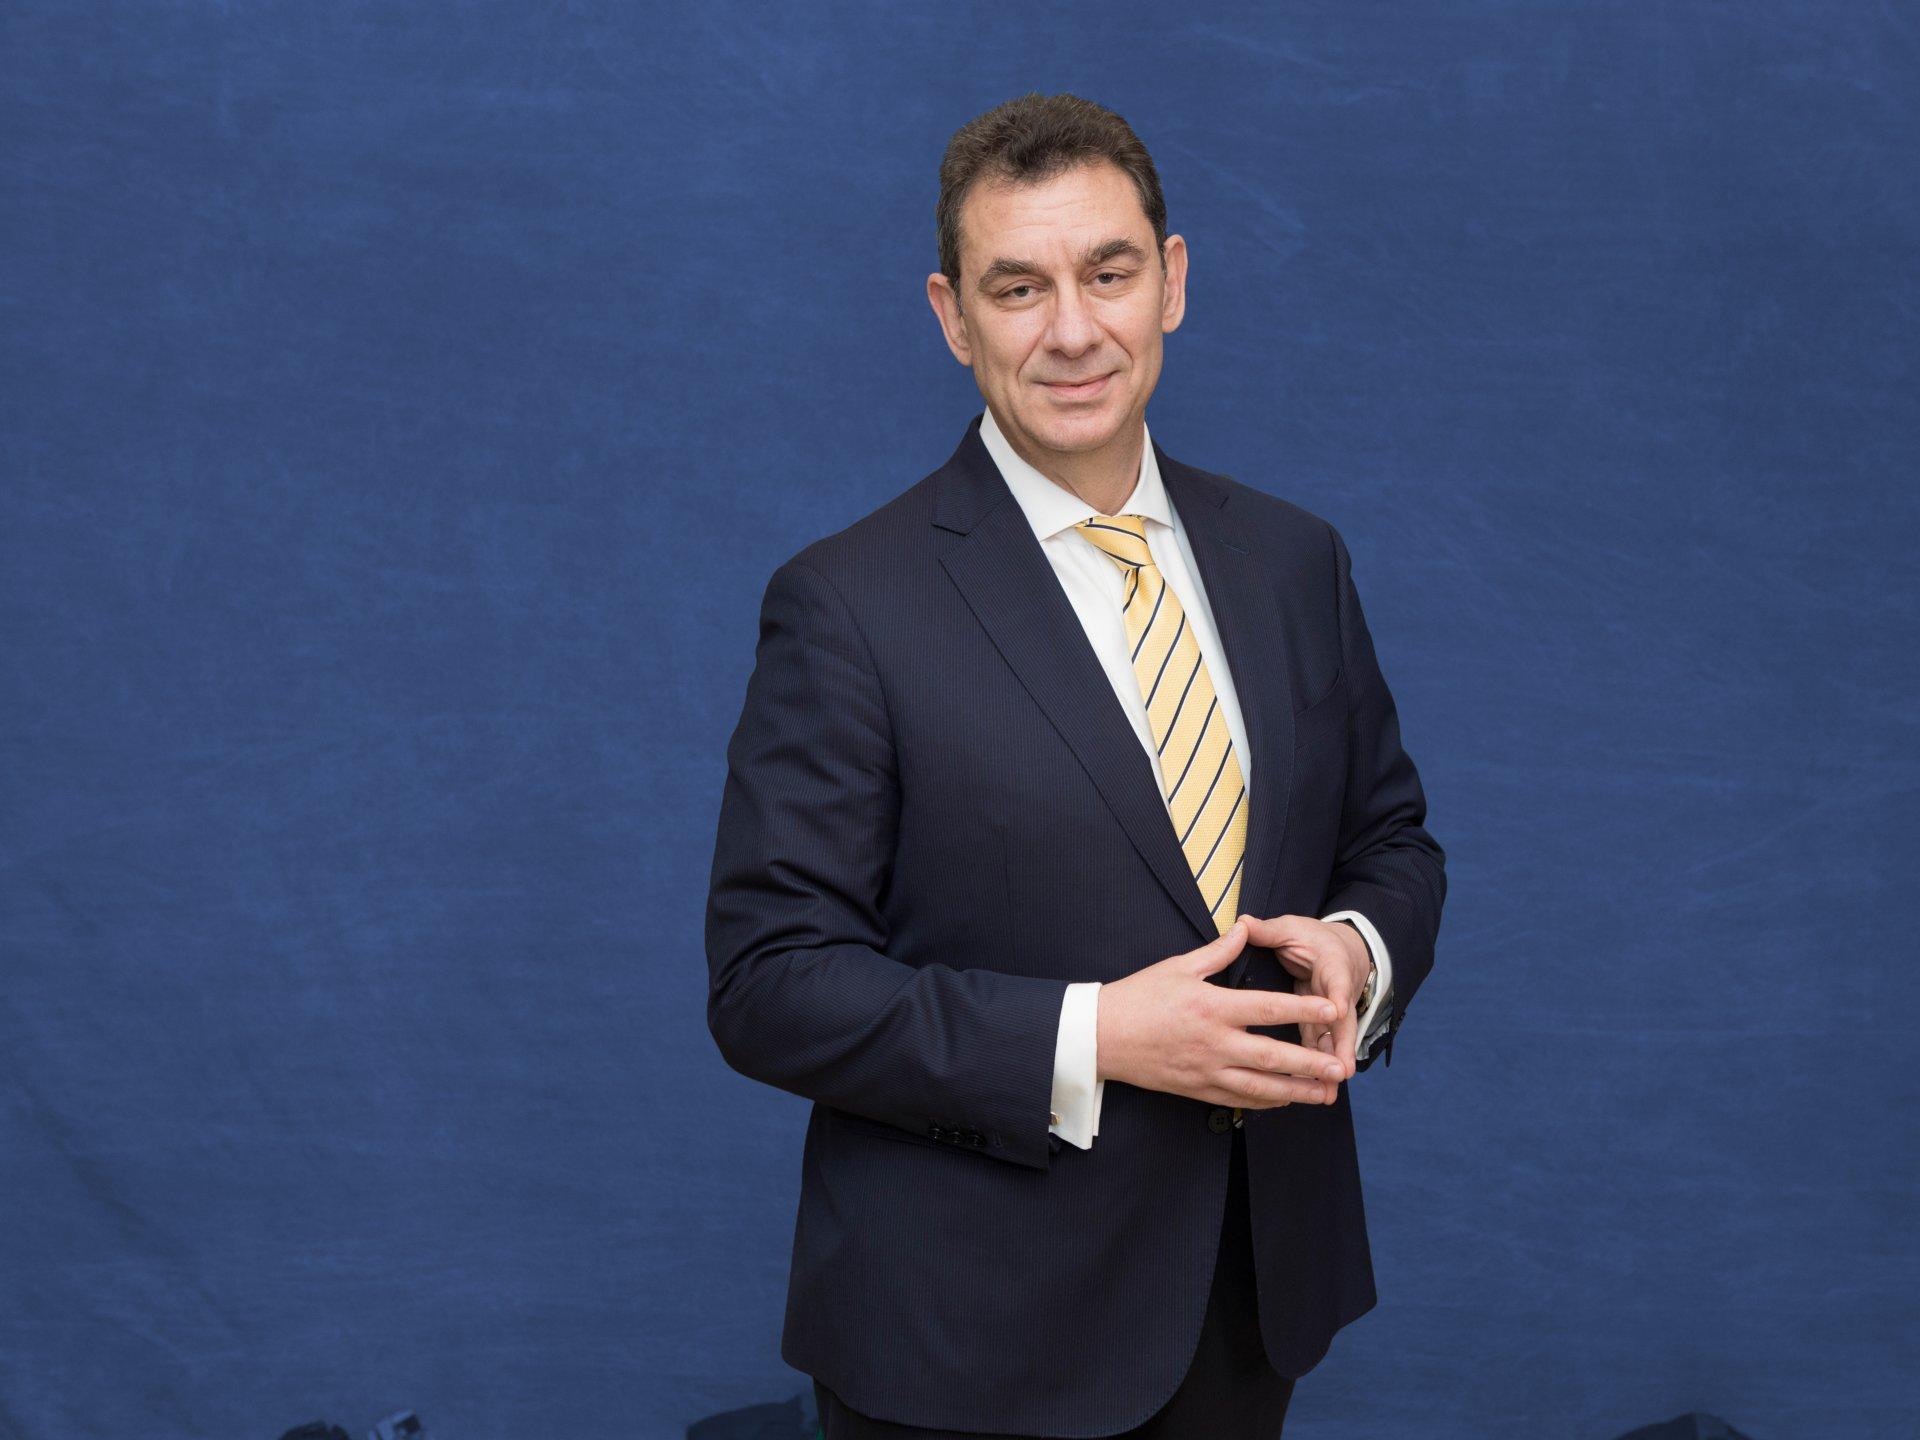 Pfizer, riding high on COVID-19 vaccine launch, pays CEO Bourla $21M for  2020 | FiercePharma